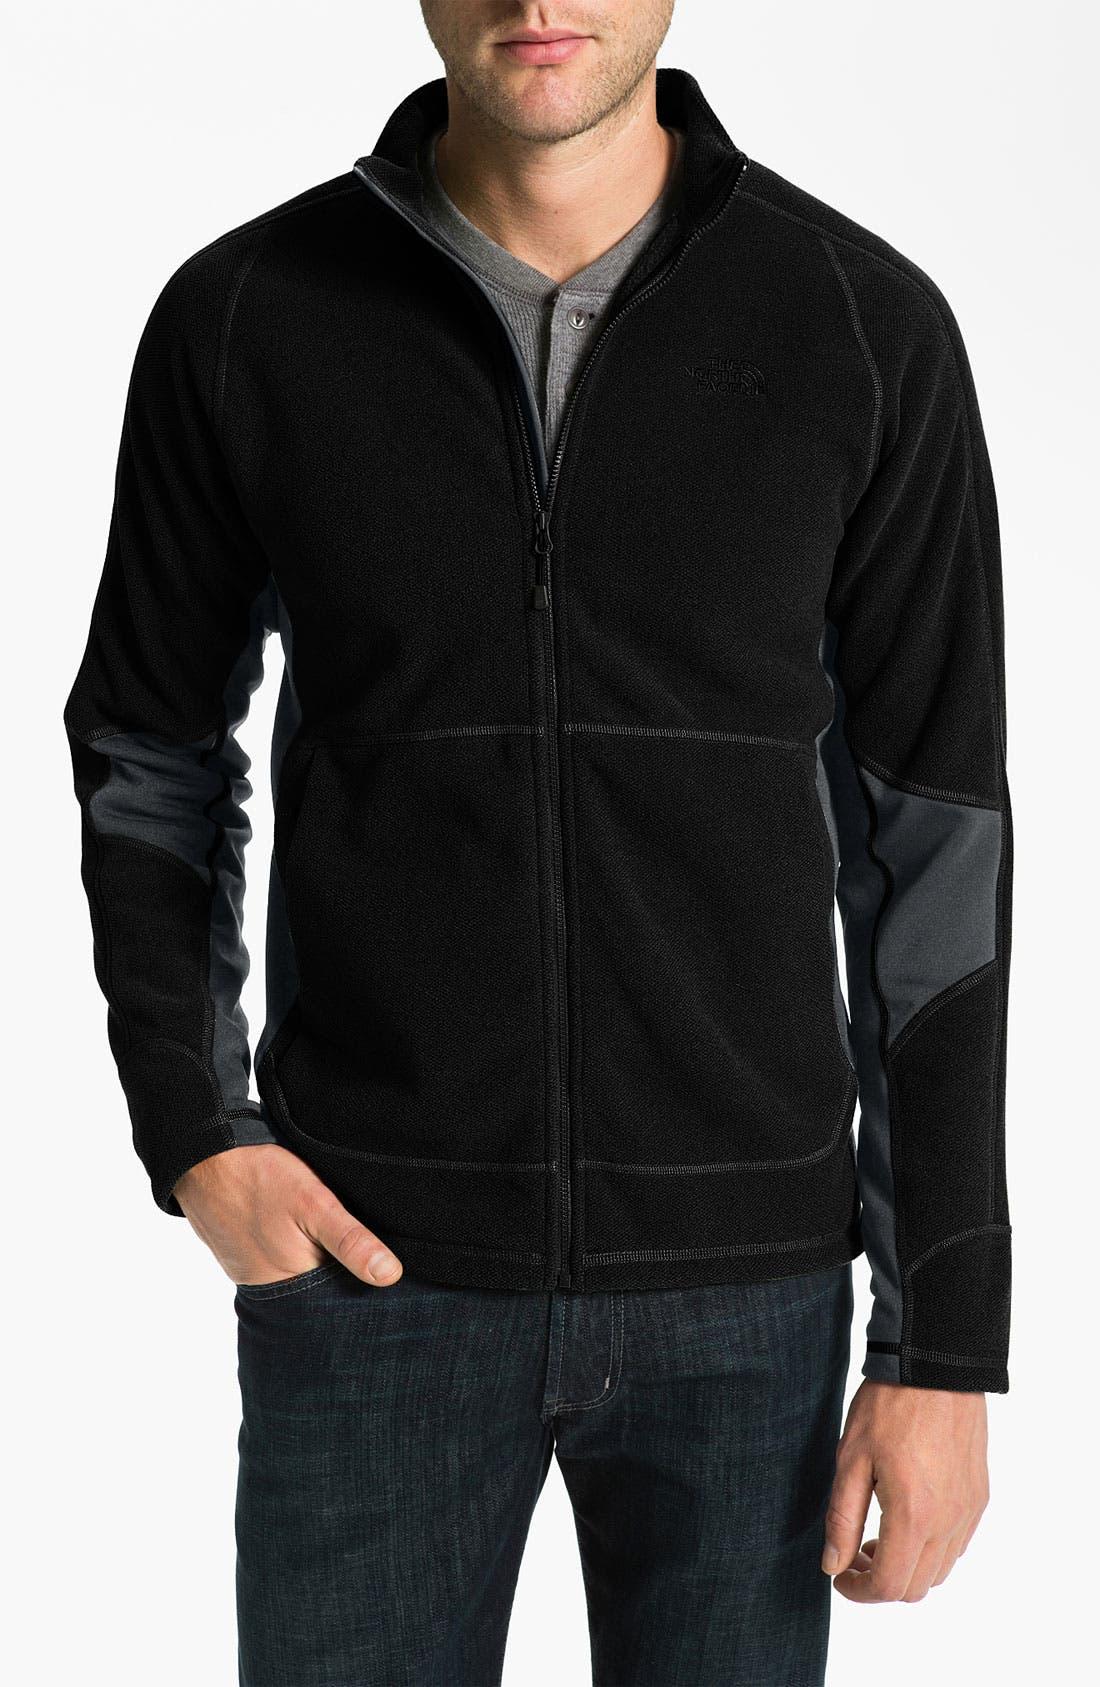 Alternate Image 1 Selected - The North Face 'Dihedral Hybrid' Fleece Jacket